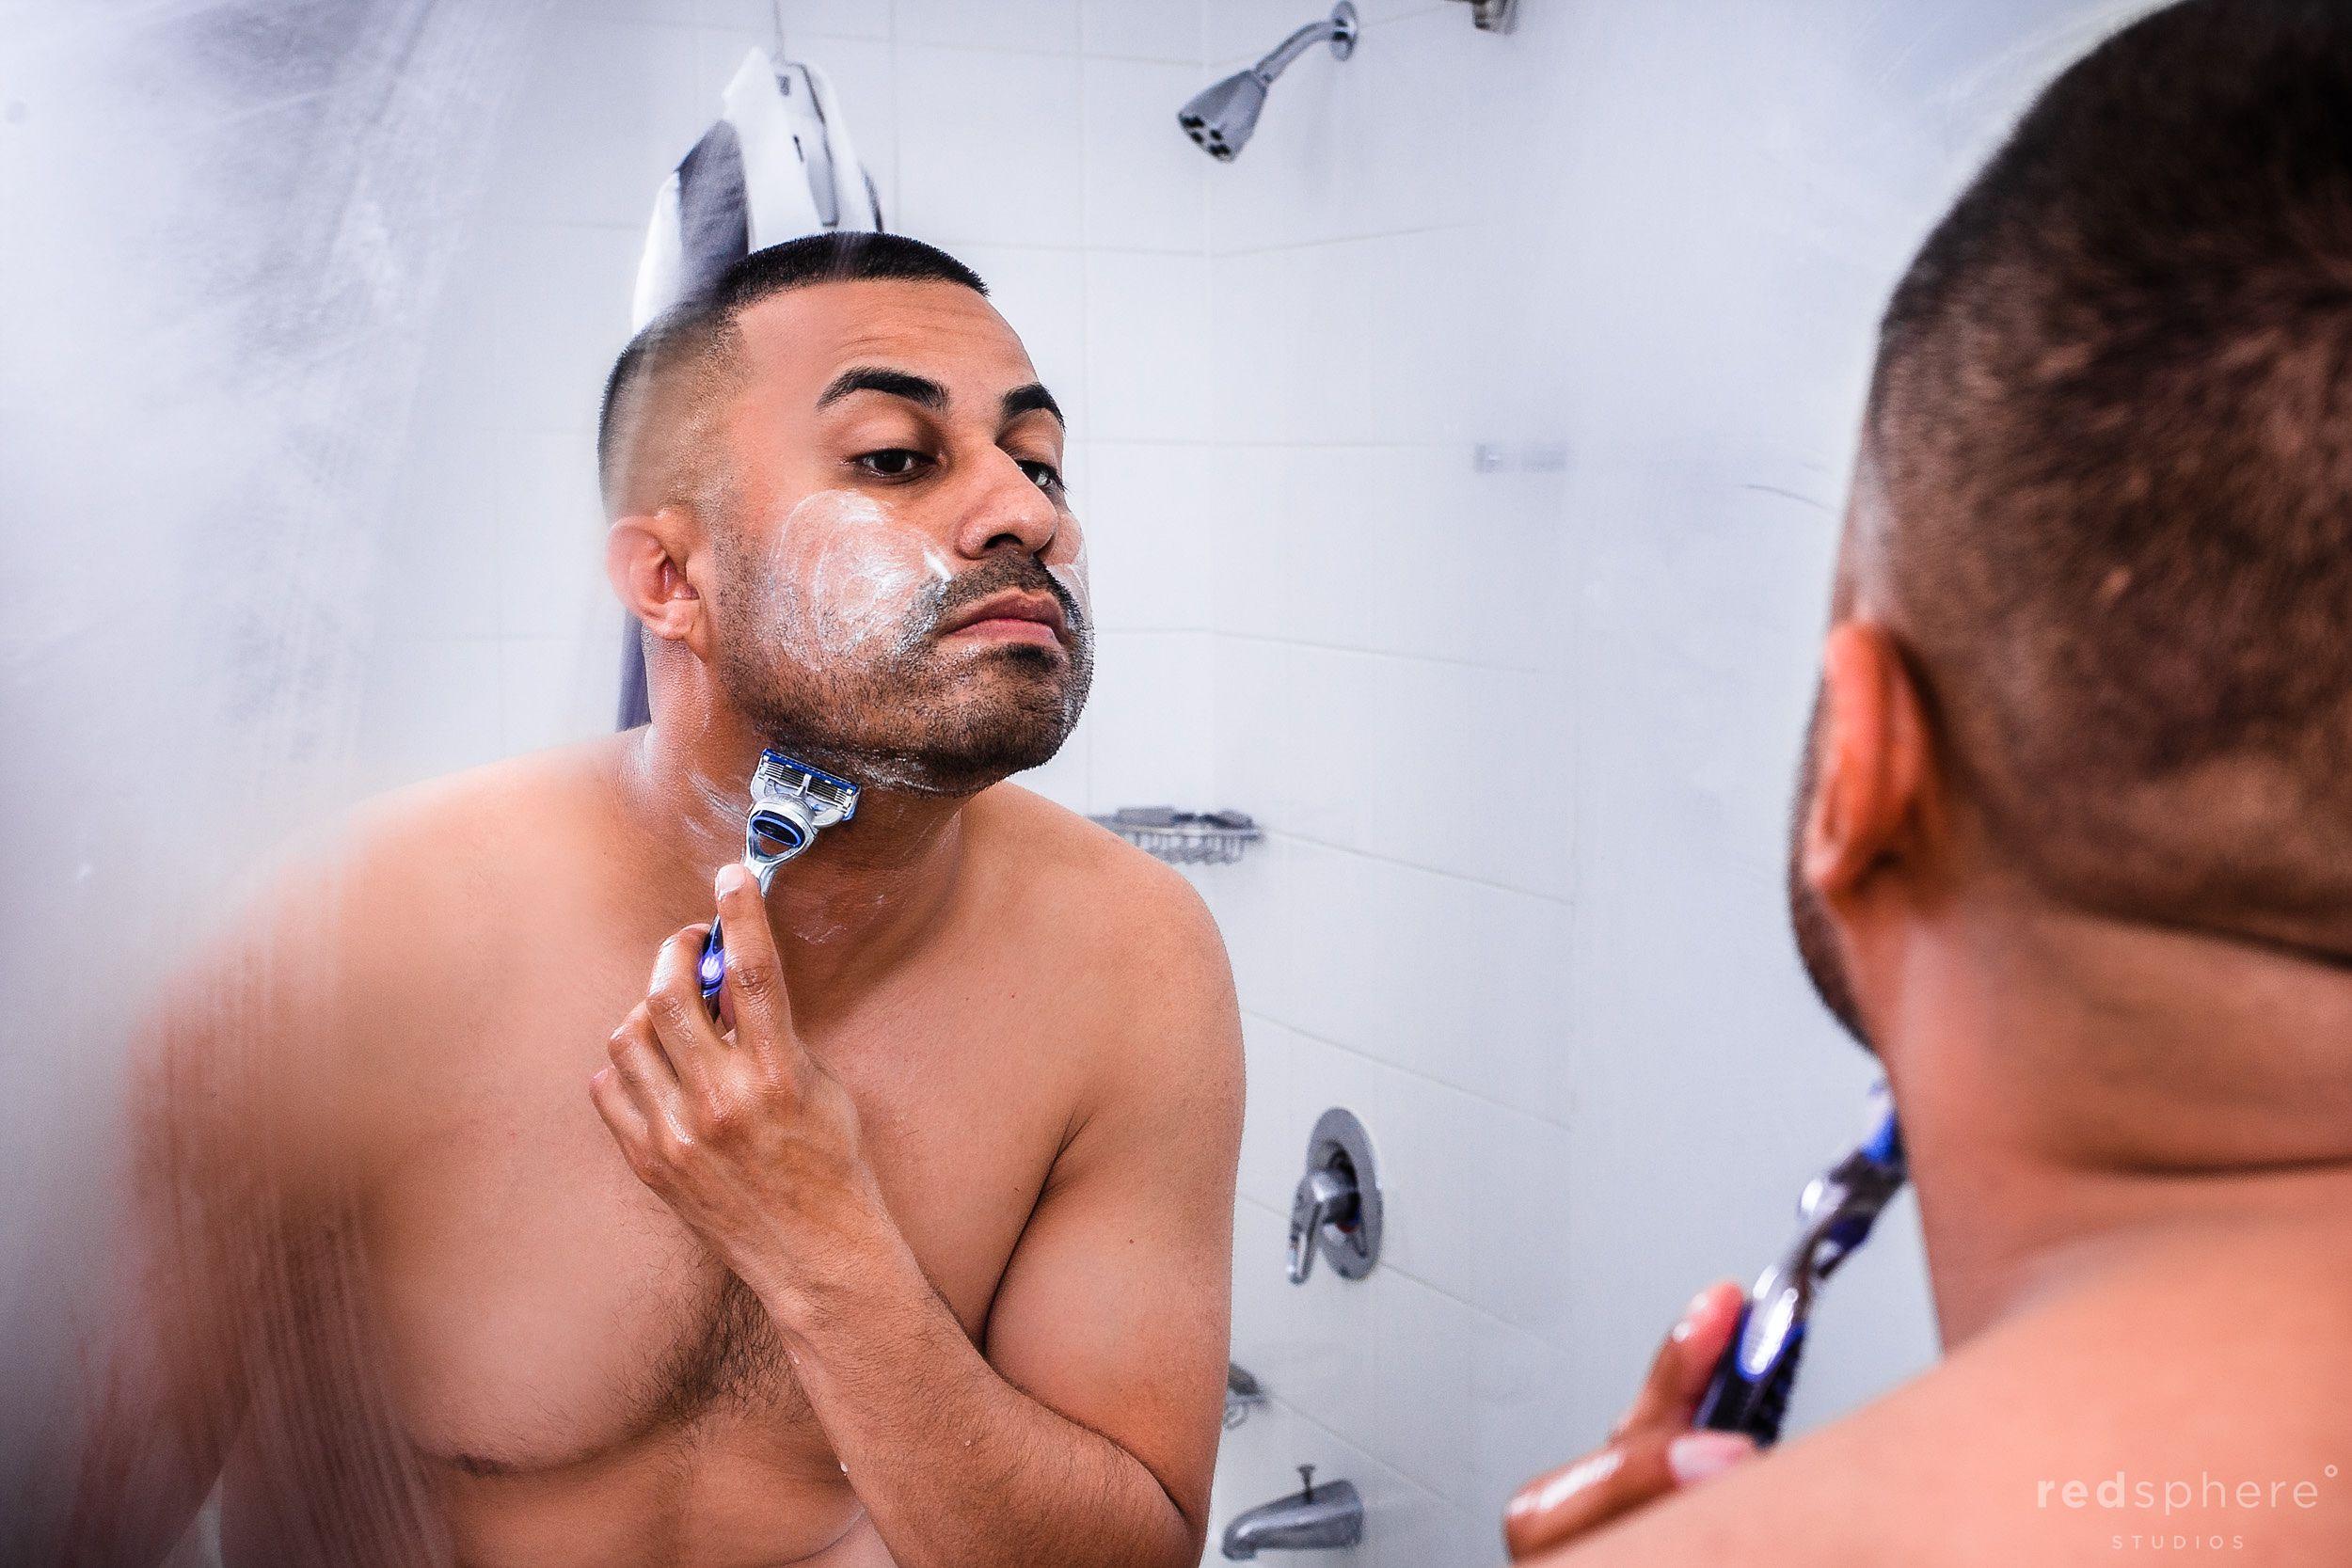 Groom Shaving Face as he Prepares for Wedding Day